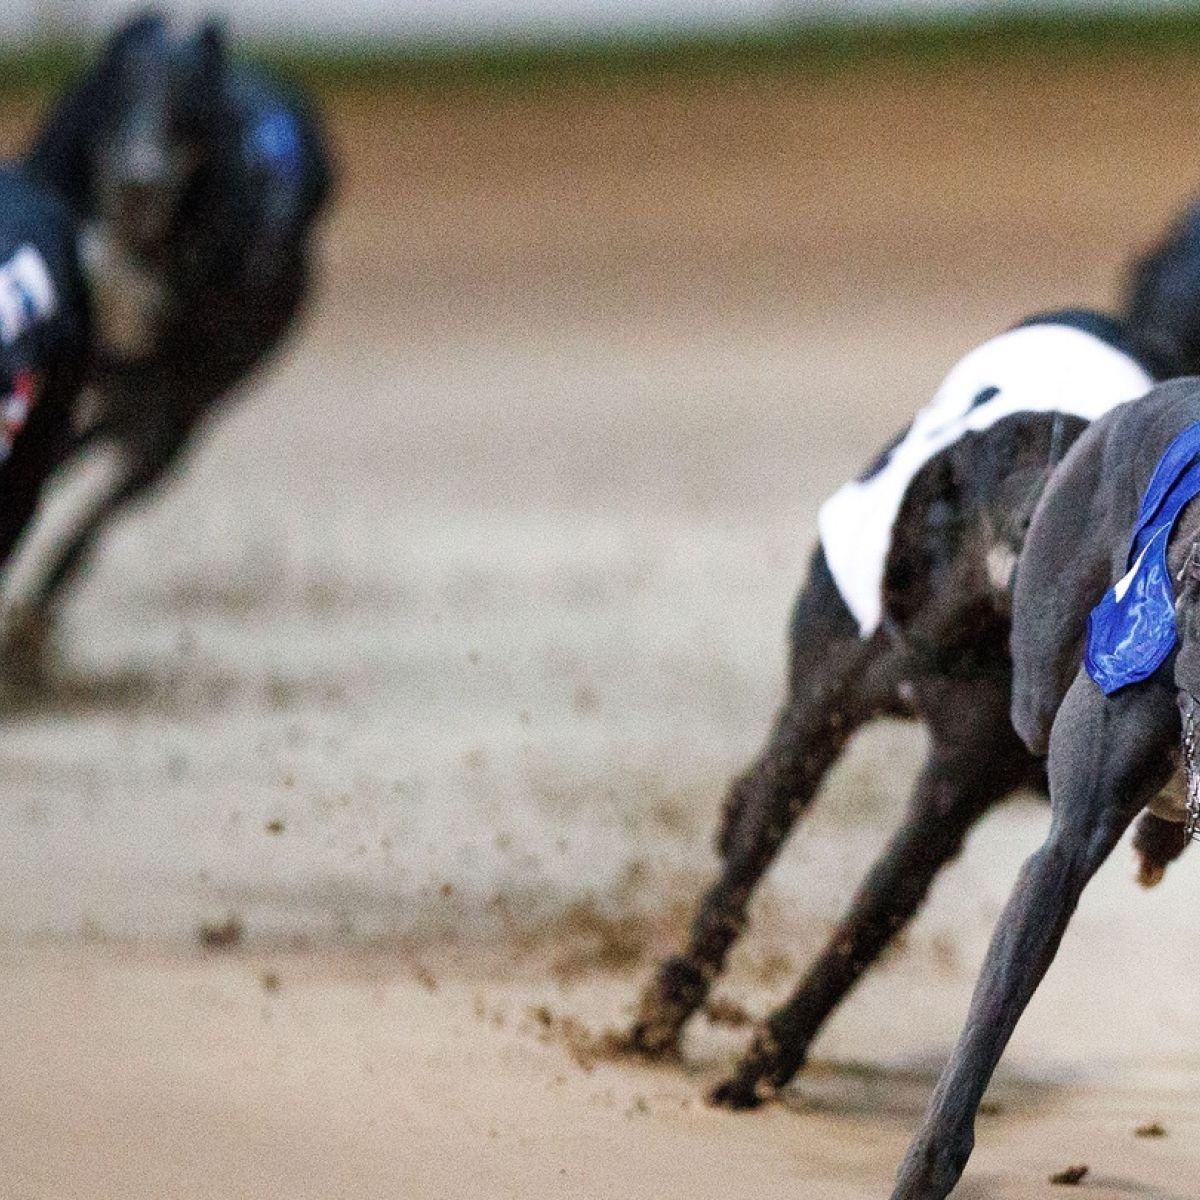 Irish greyhound derby betting 2021 movies spread betting payout chart